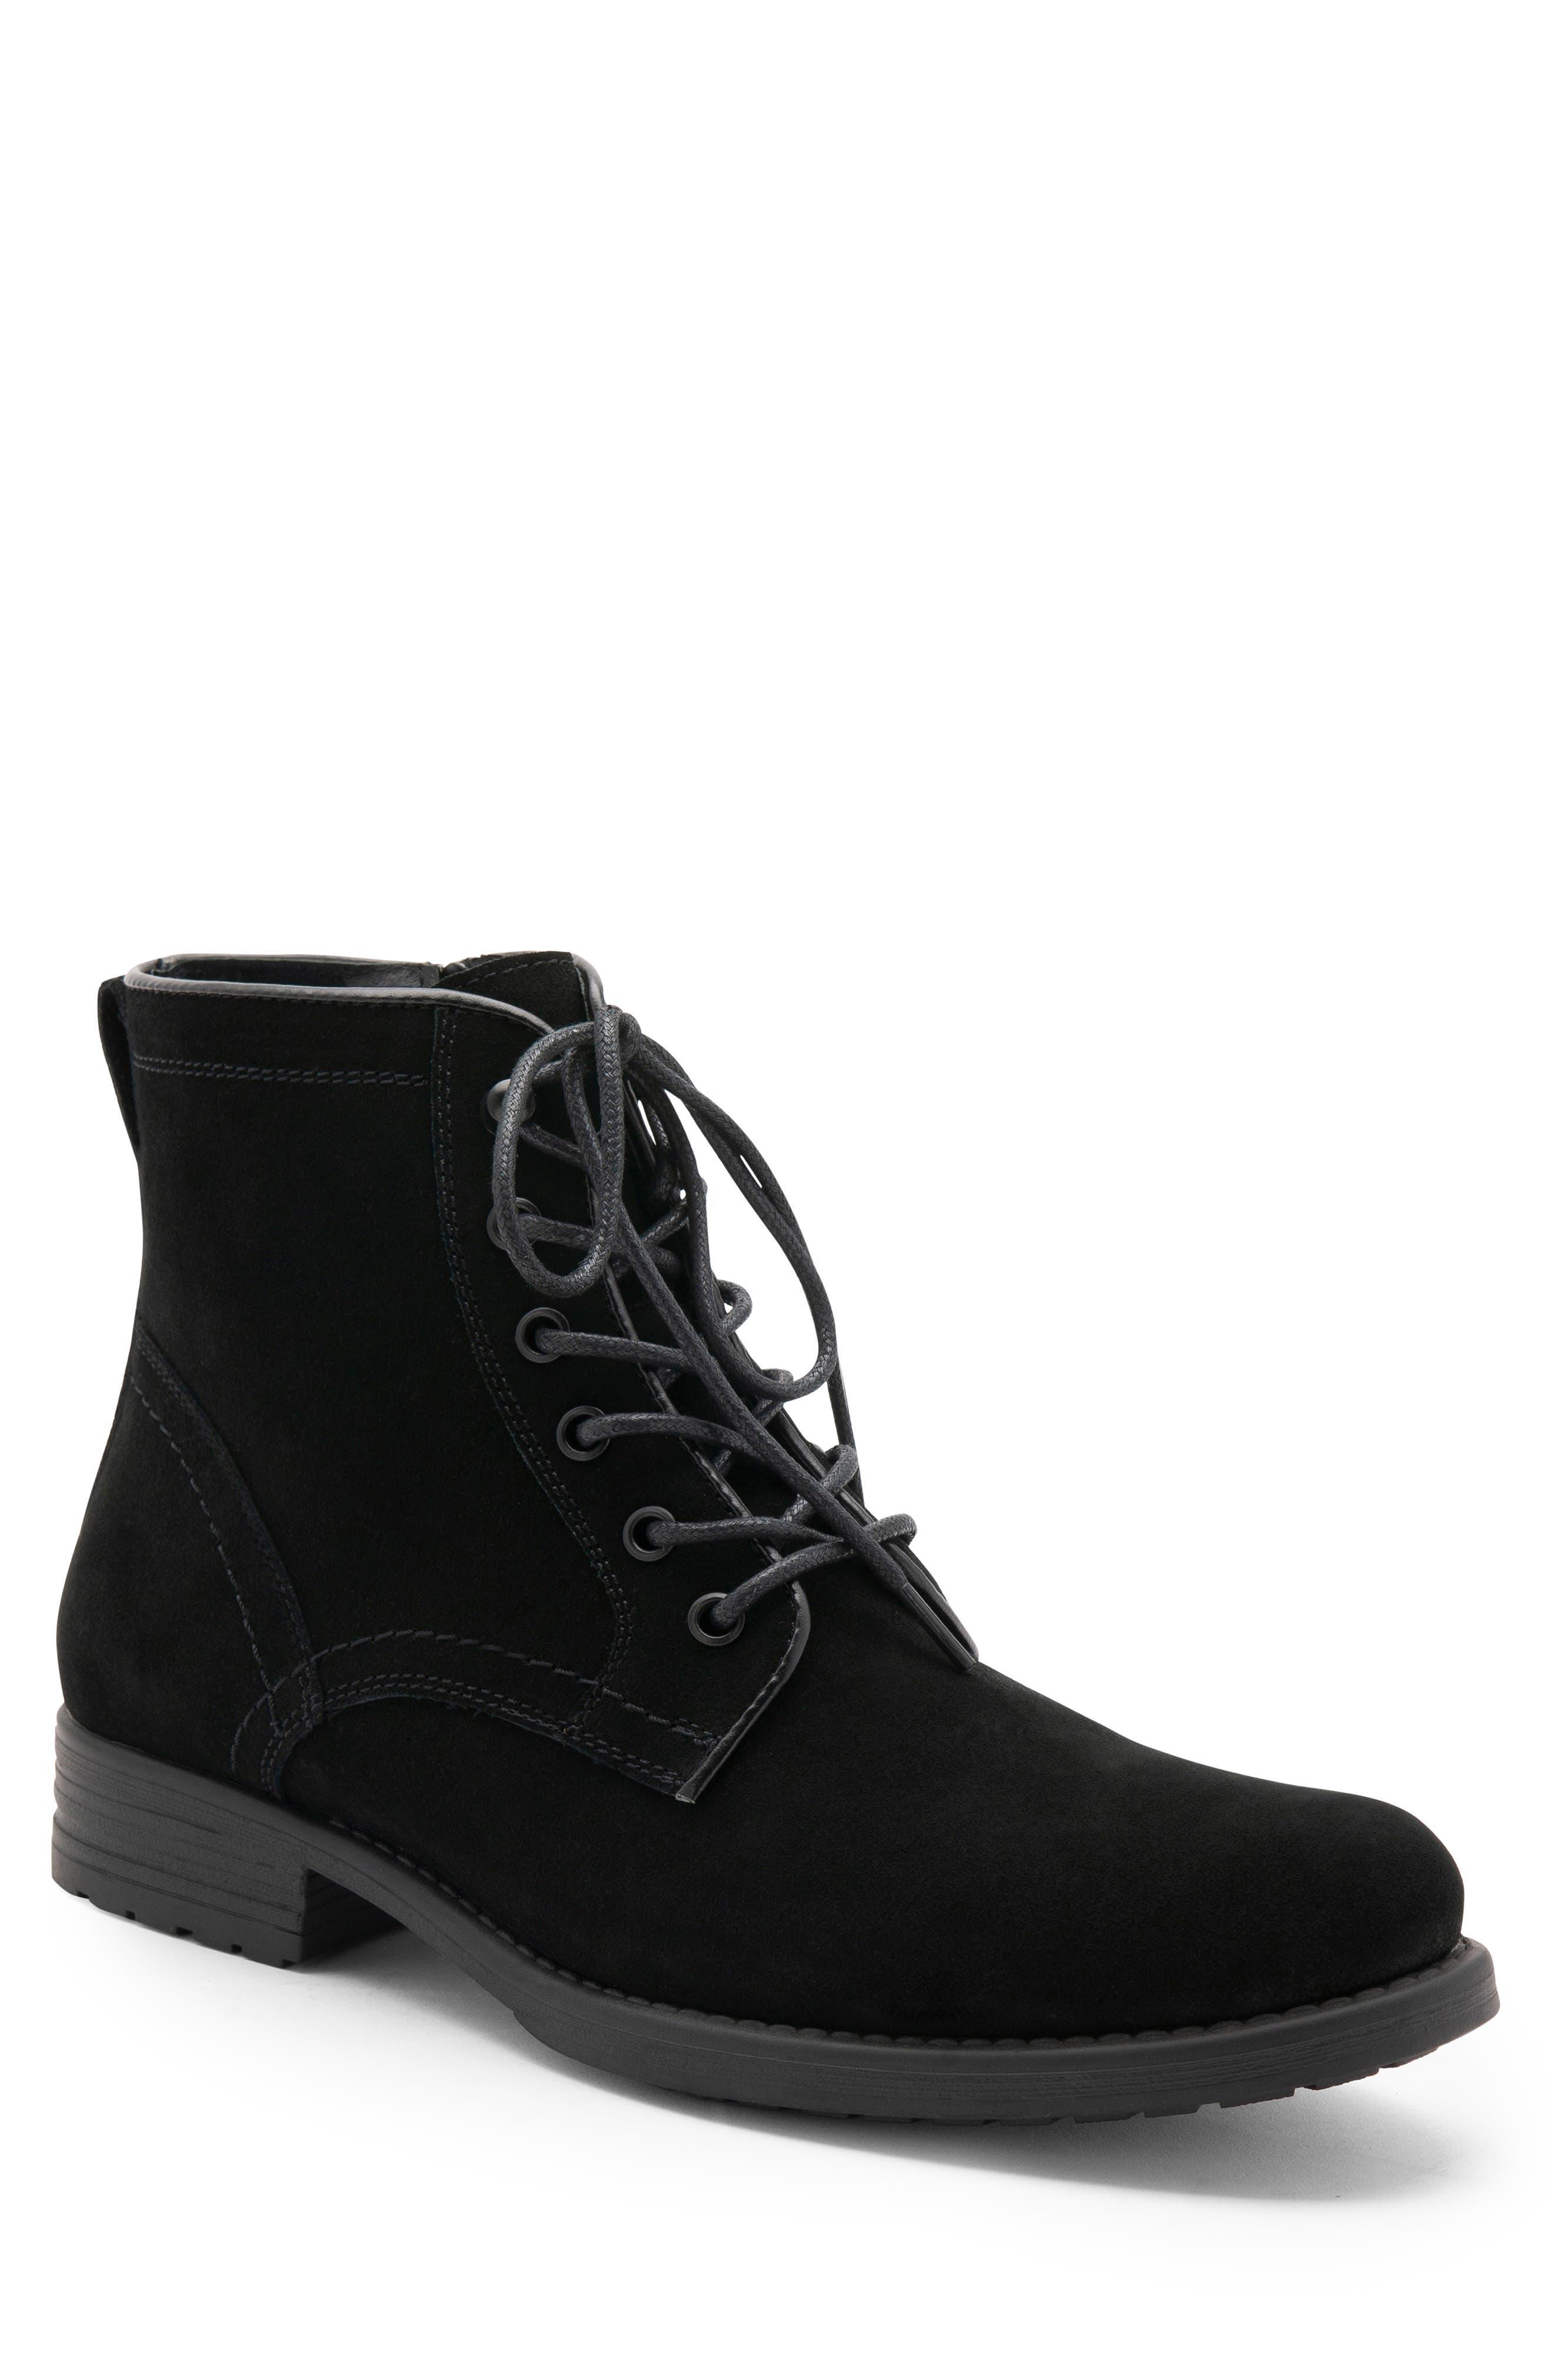 BLONDO, Peter Waterproof Plain Toe Boot, Main thumbnail 1, color, BLACK SUEDE